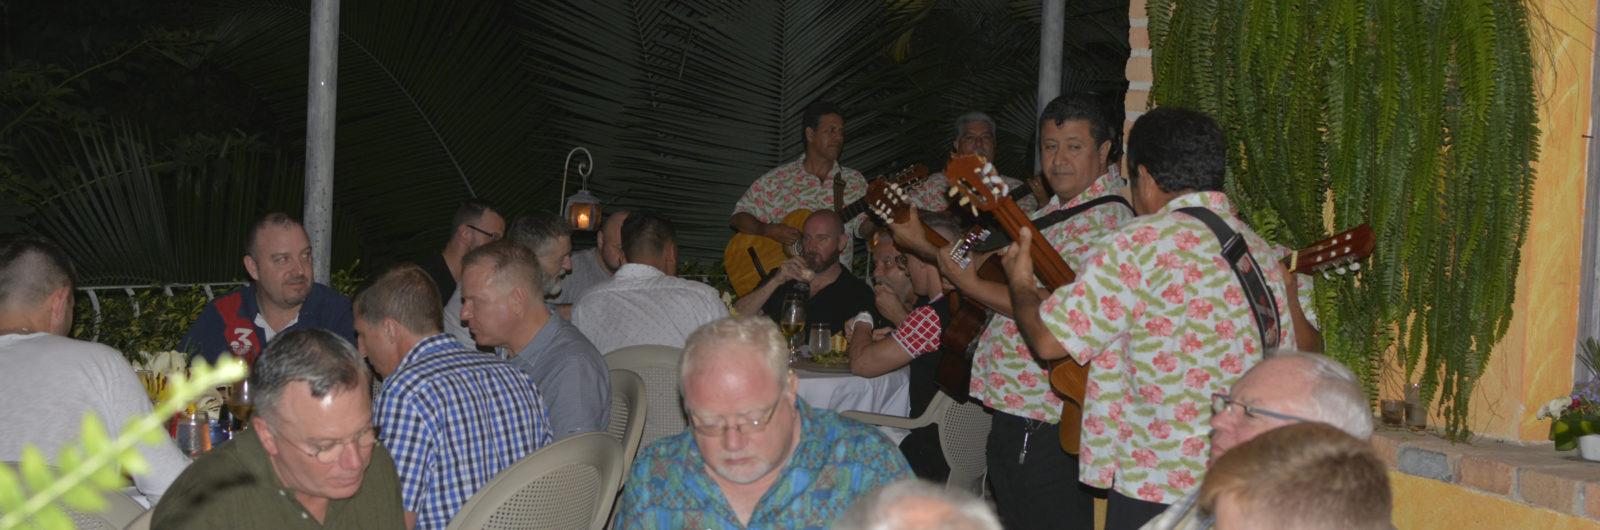 PUERTO VALLARTA BEACH CLUB & VILLA VERANO